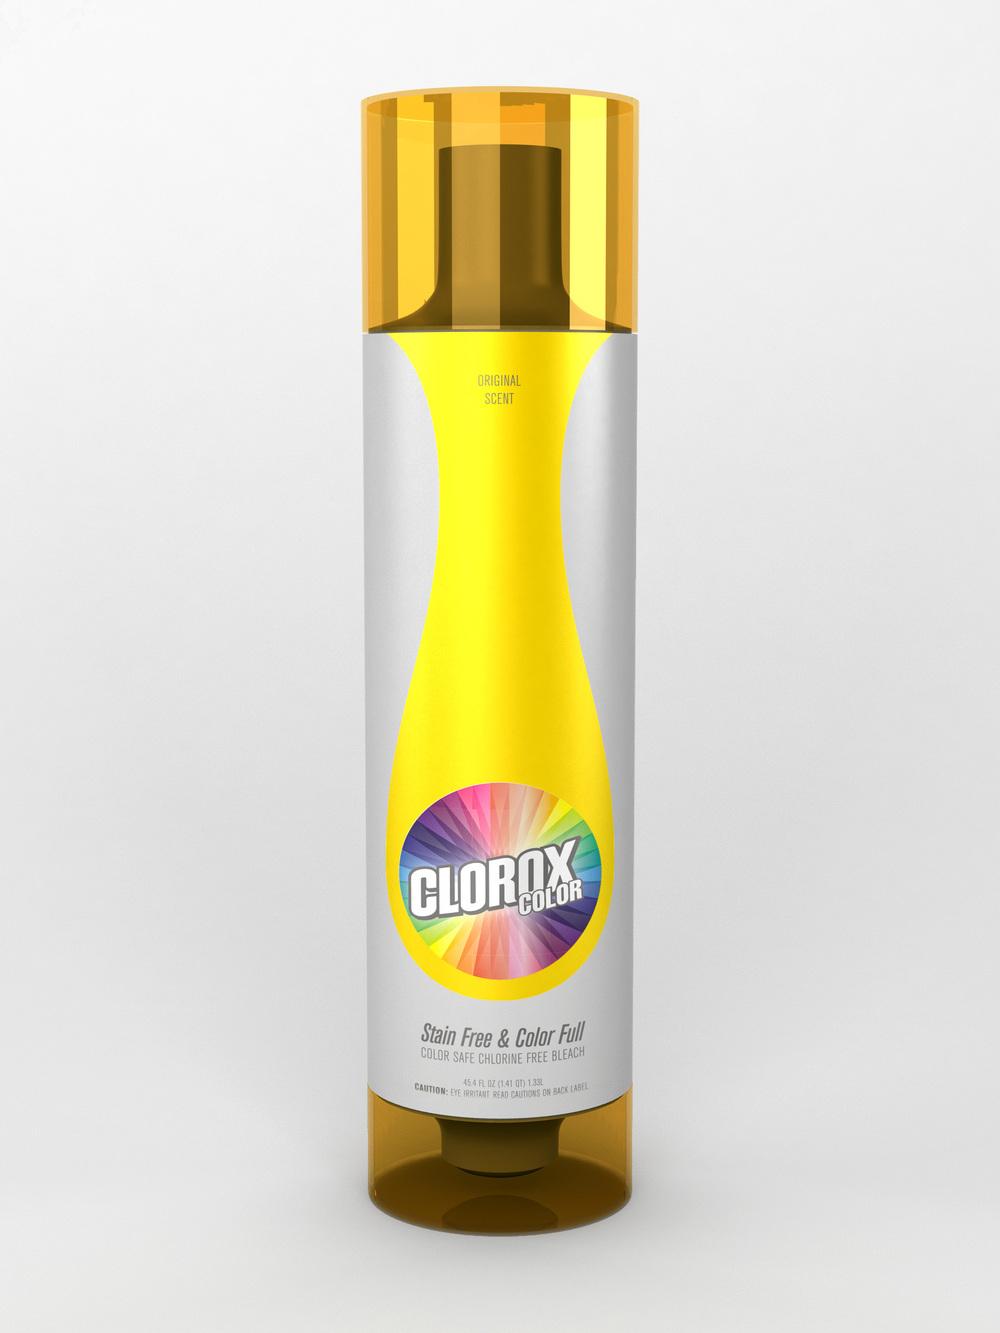 2011.06.26 CRX bottle#3 3delev var1yellow rev0.jpg